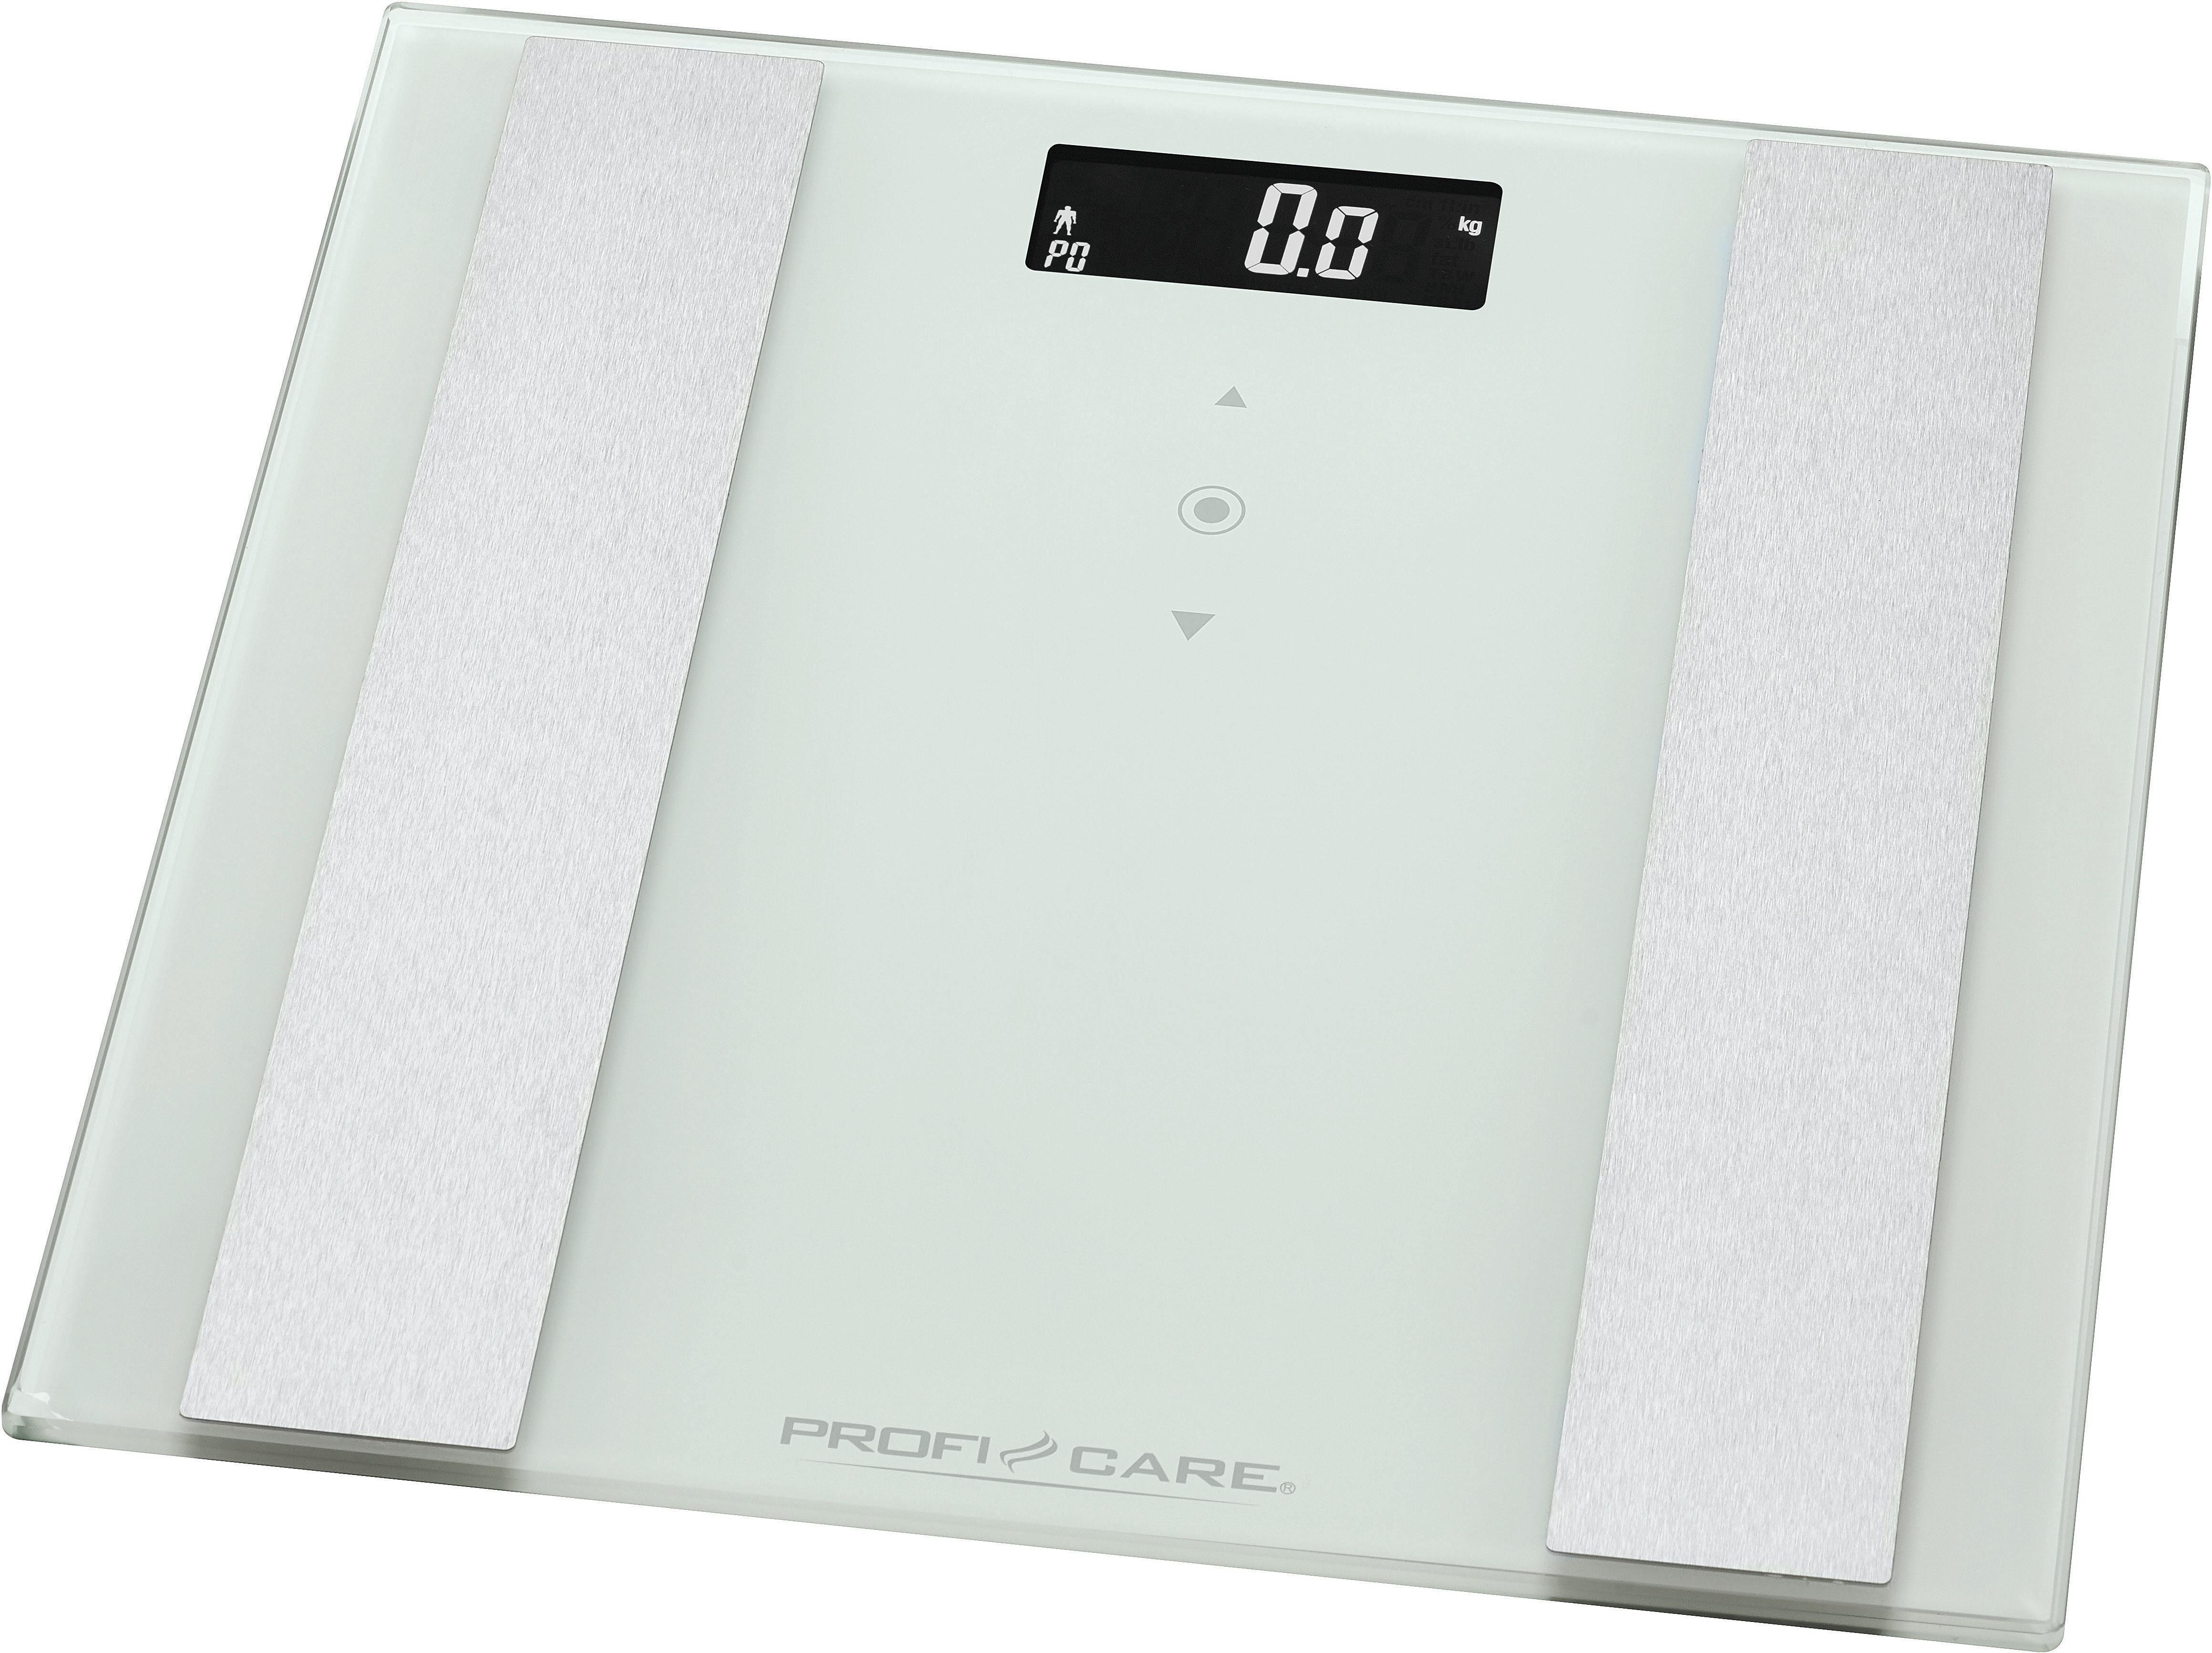 9 in 1 mit Bluetooth ProfiCare Körper-Analyse-Waage PC-PW 3008 BT